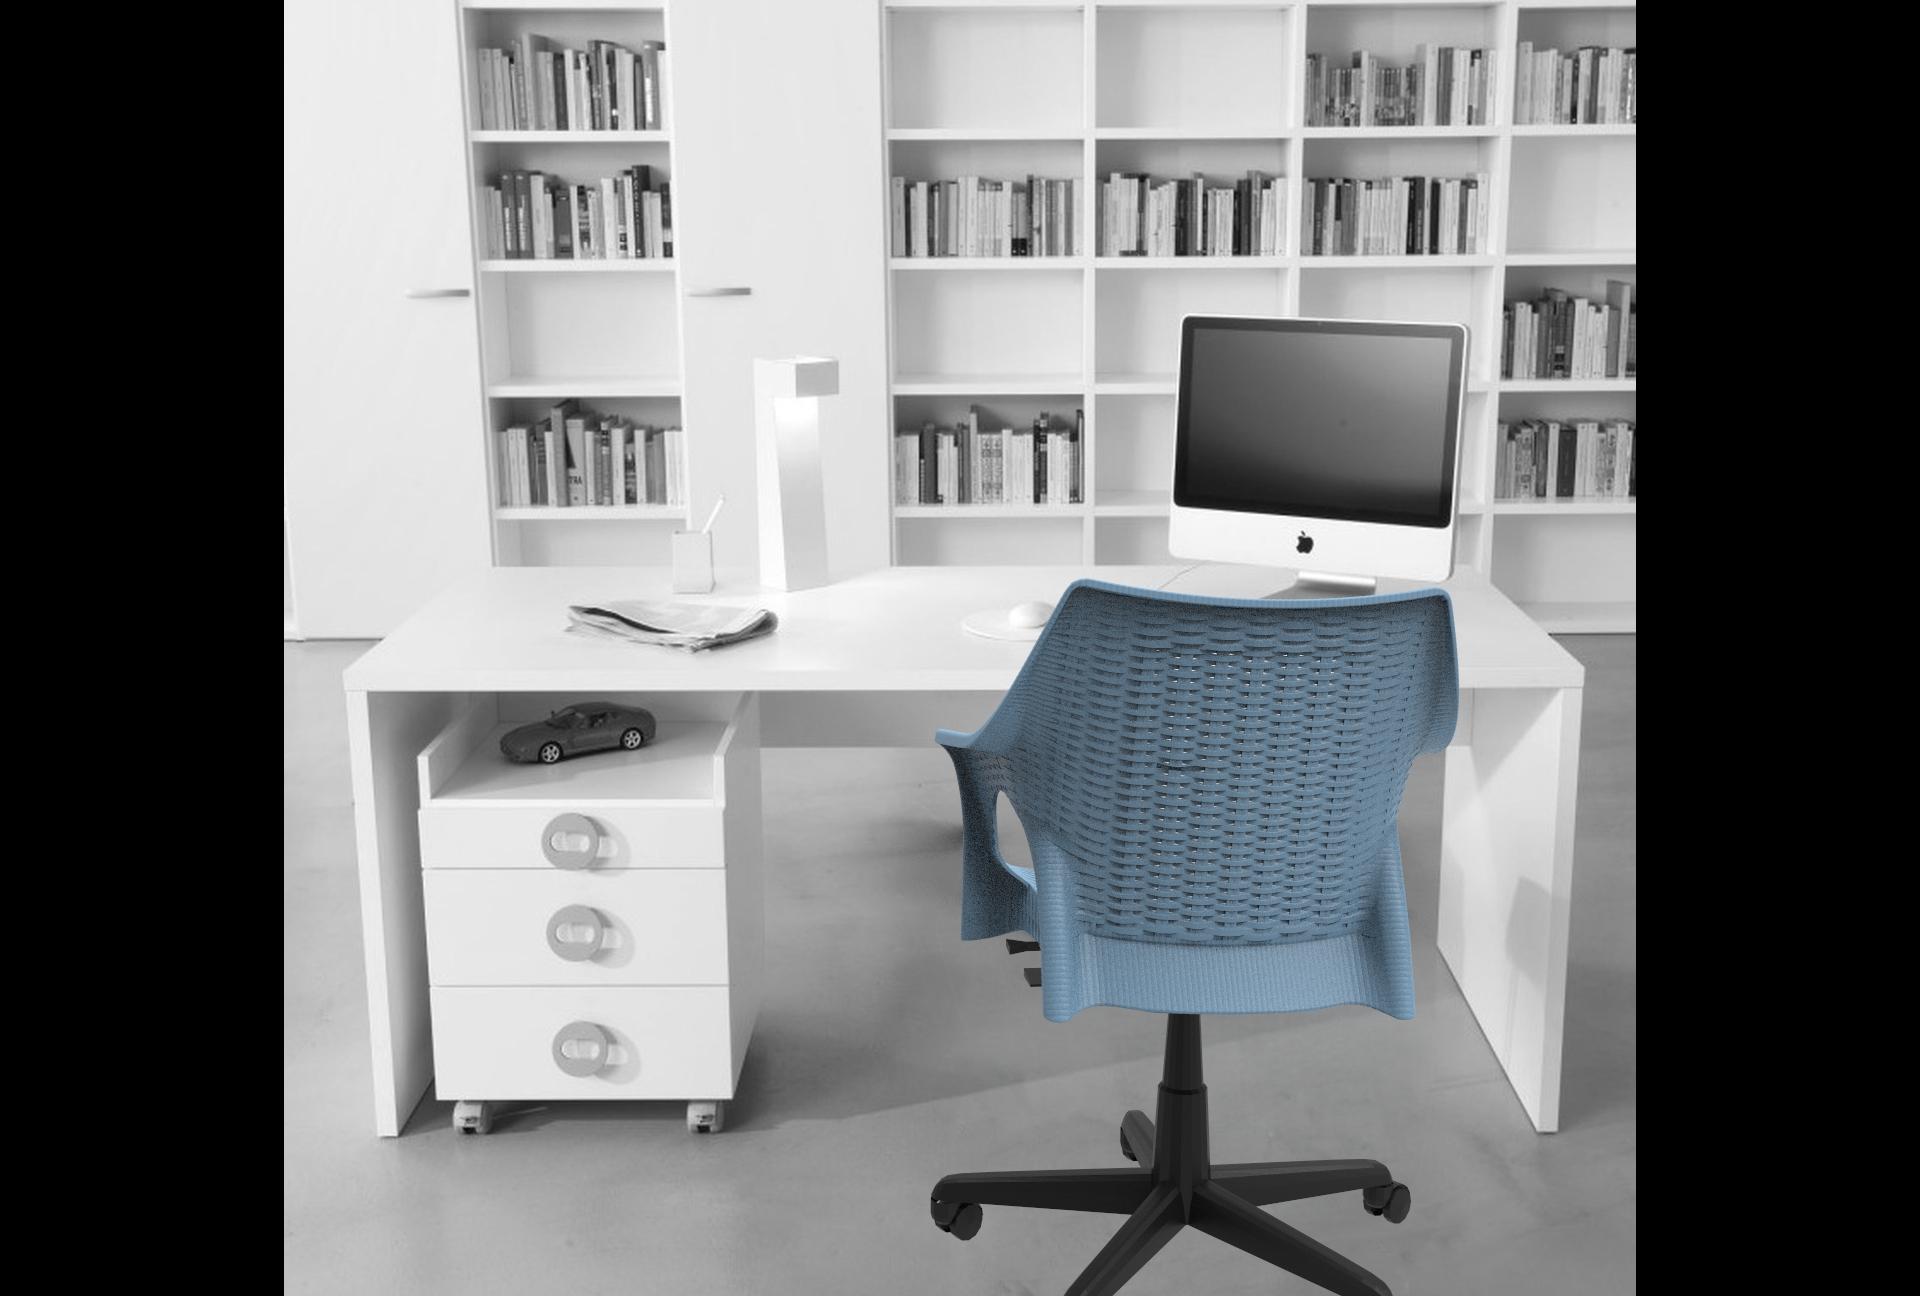 relic office.698.jpg